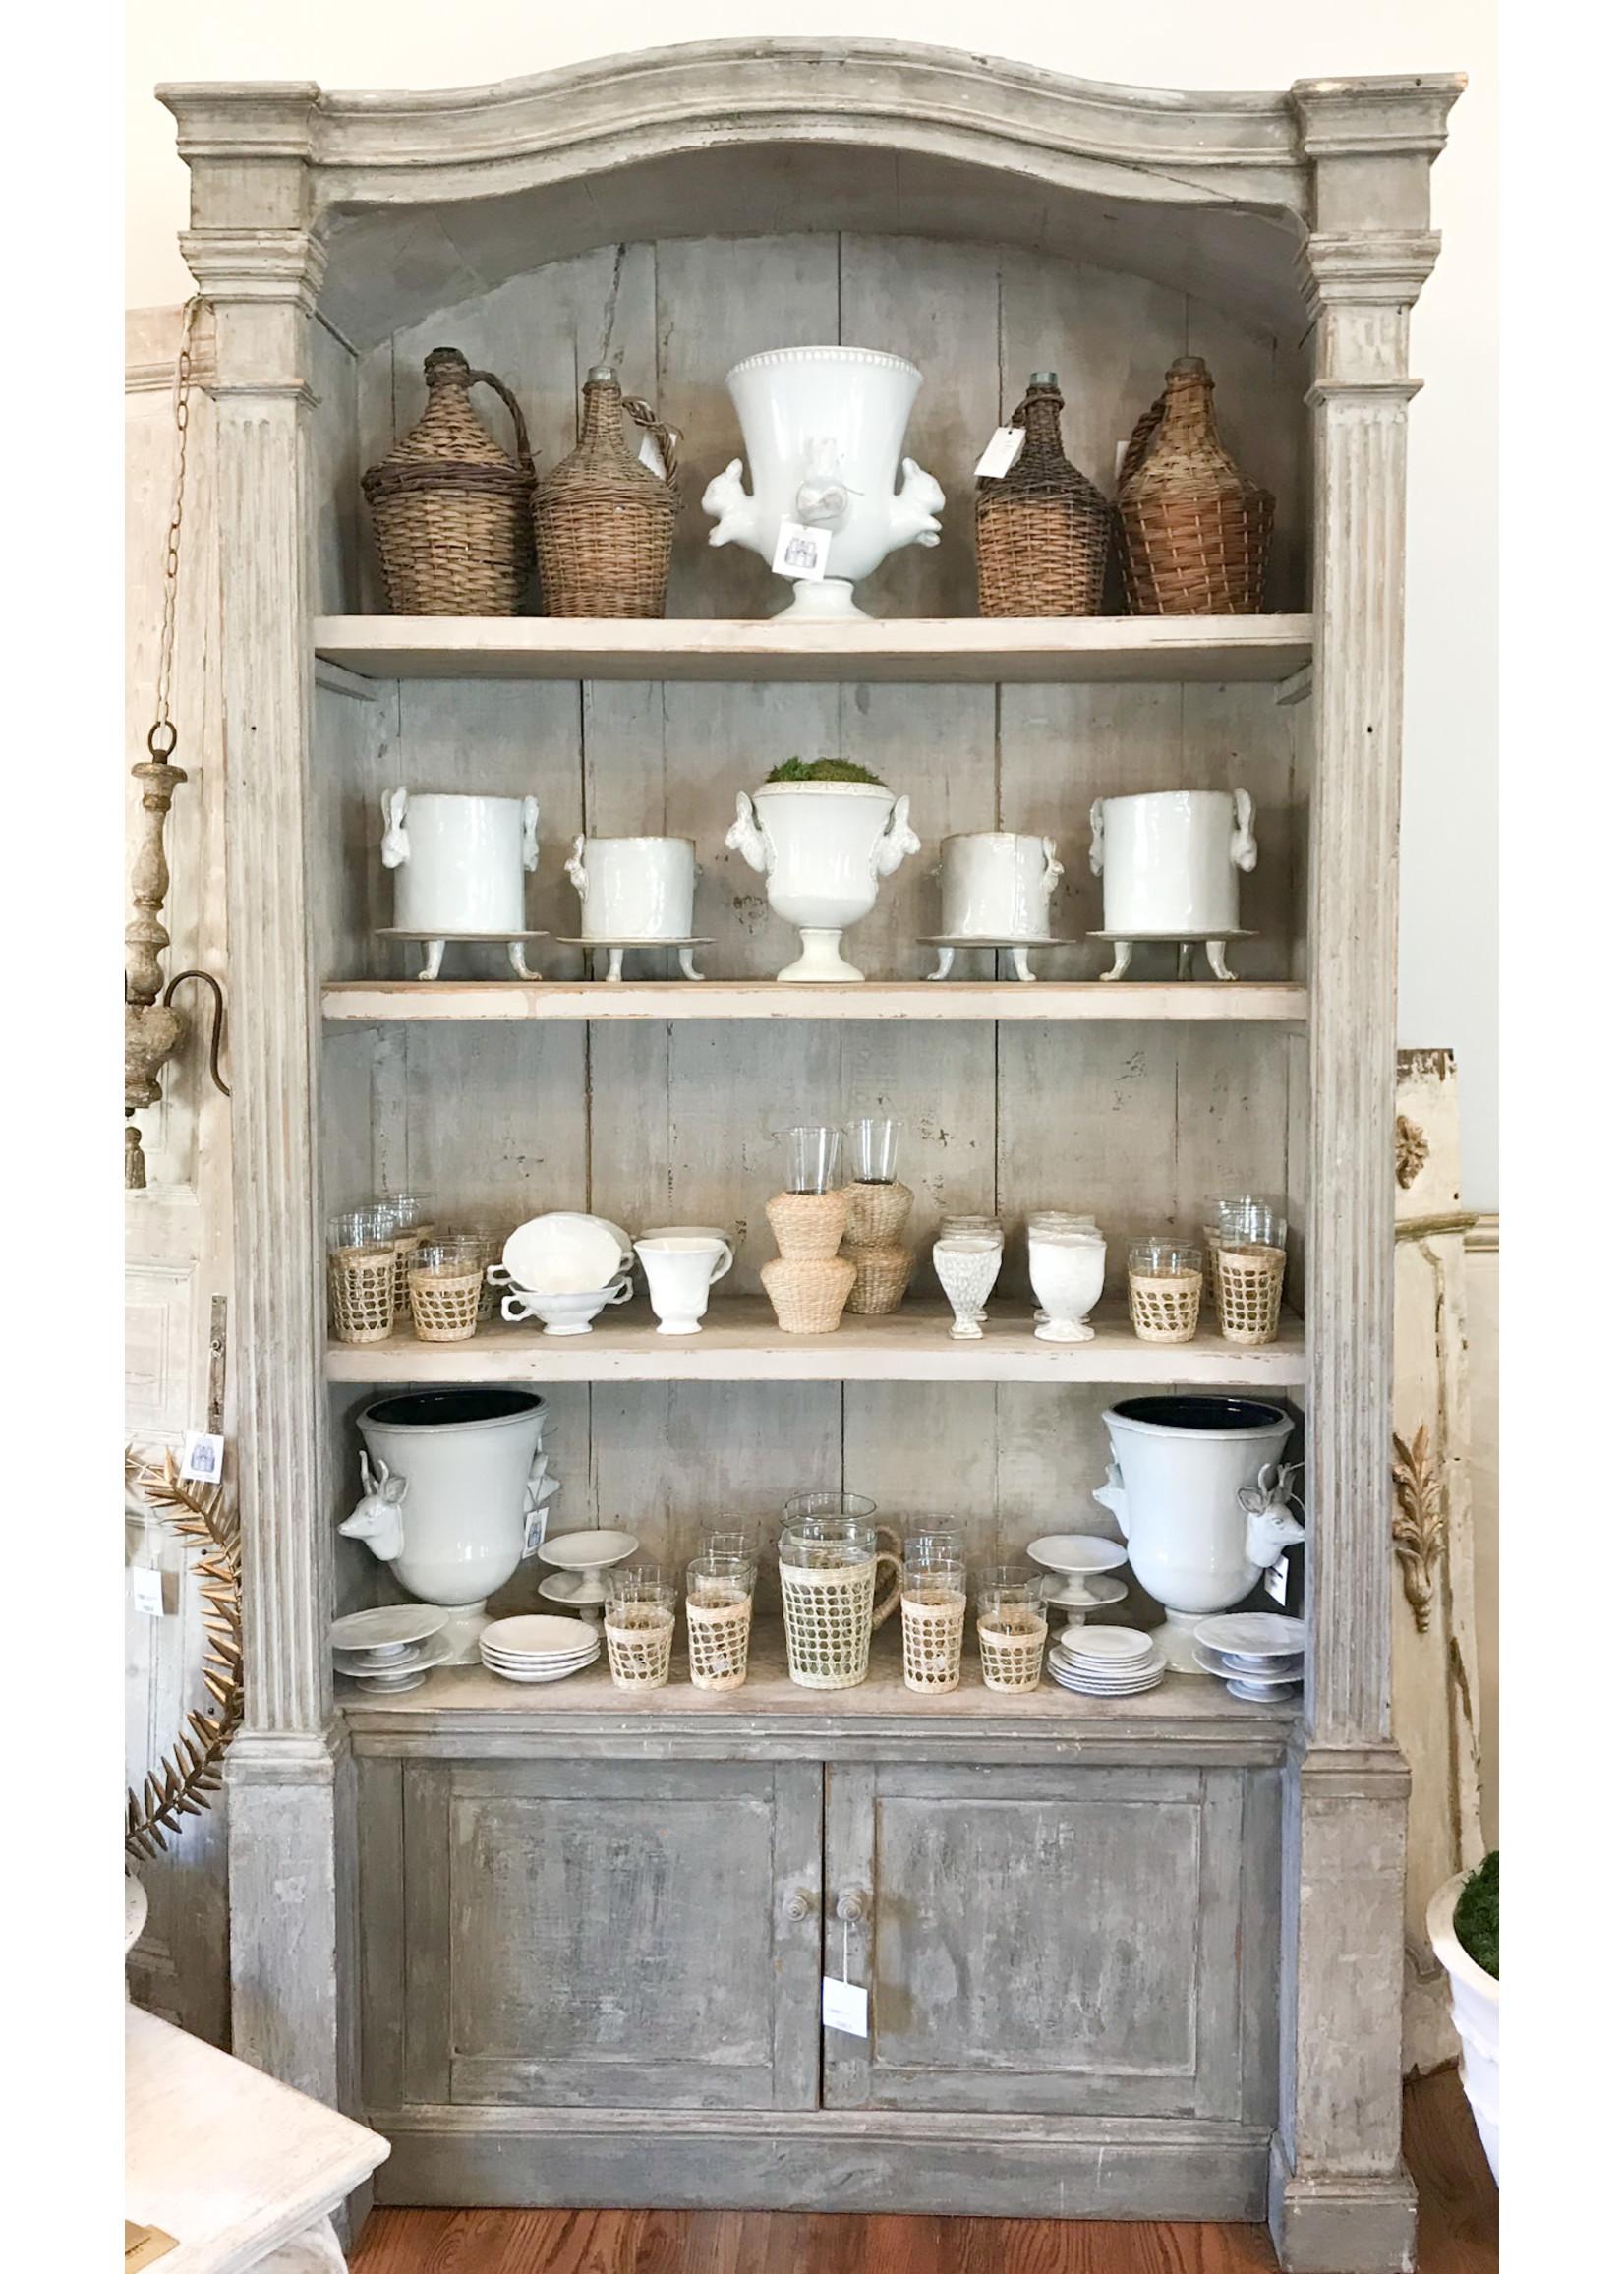 Antique Antique Bookshelf from France